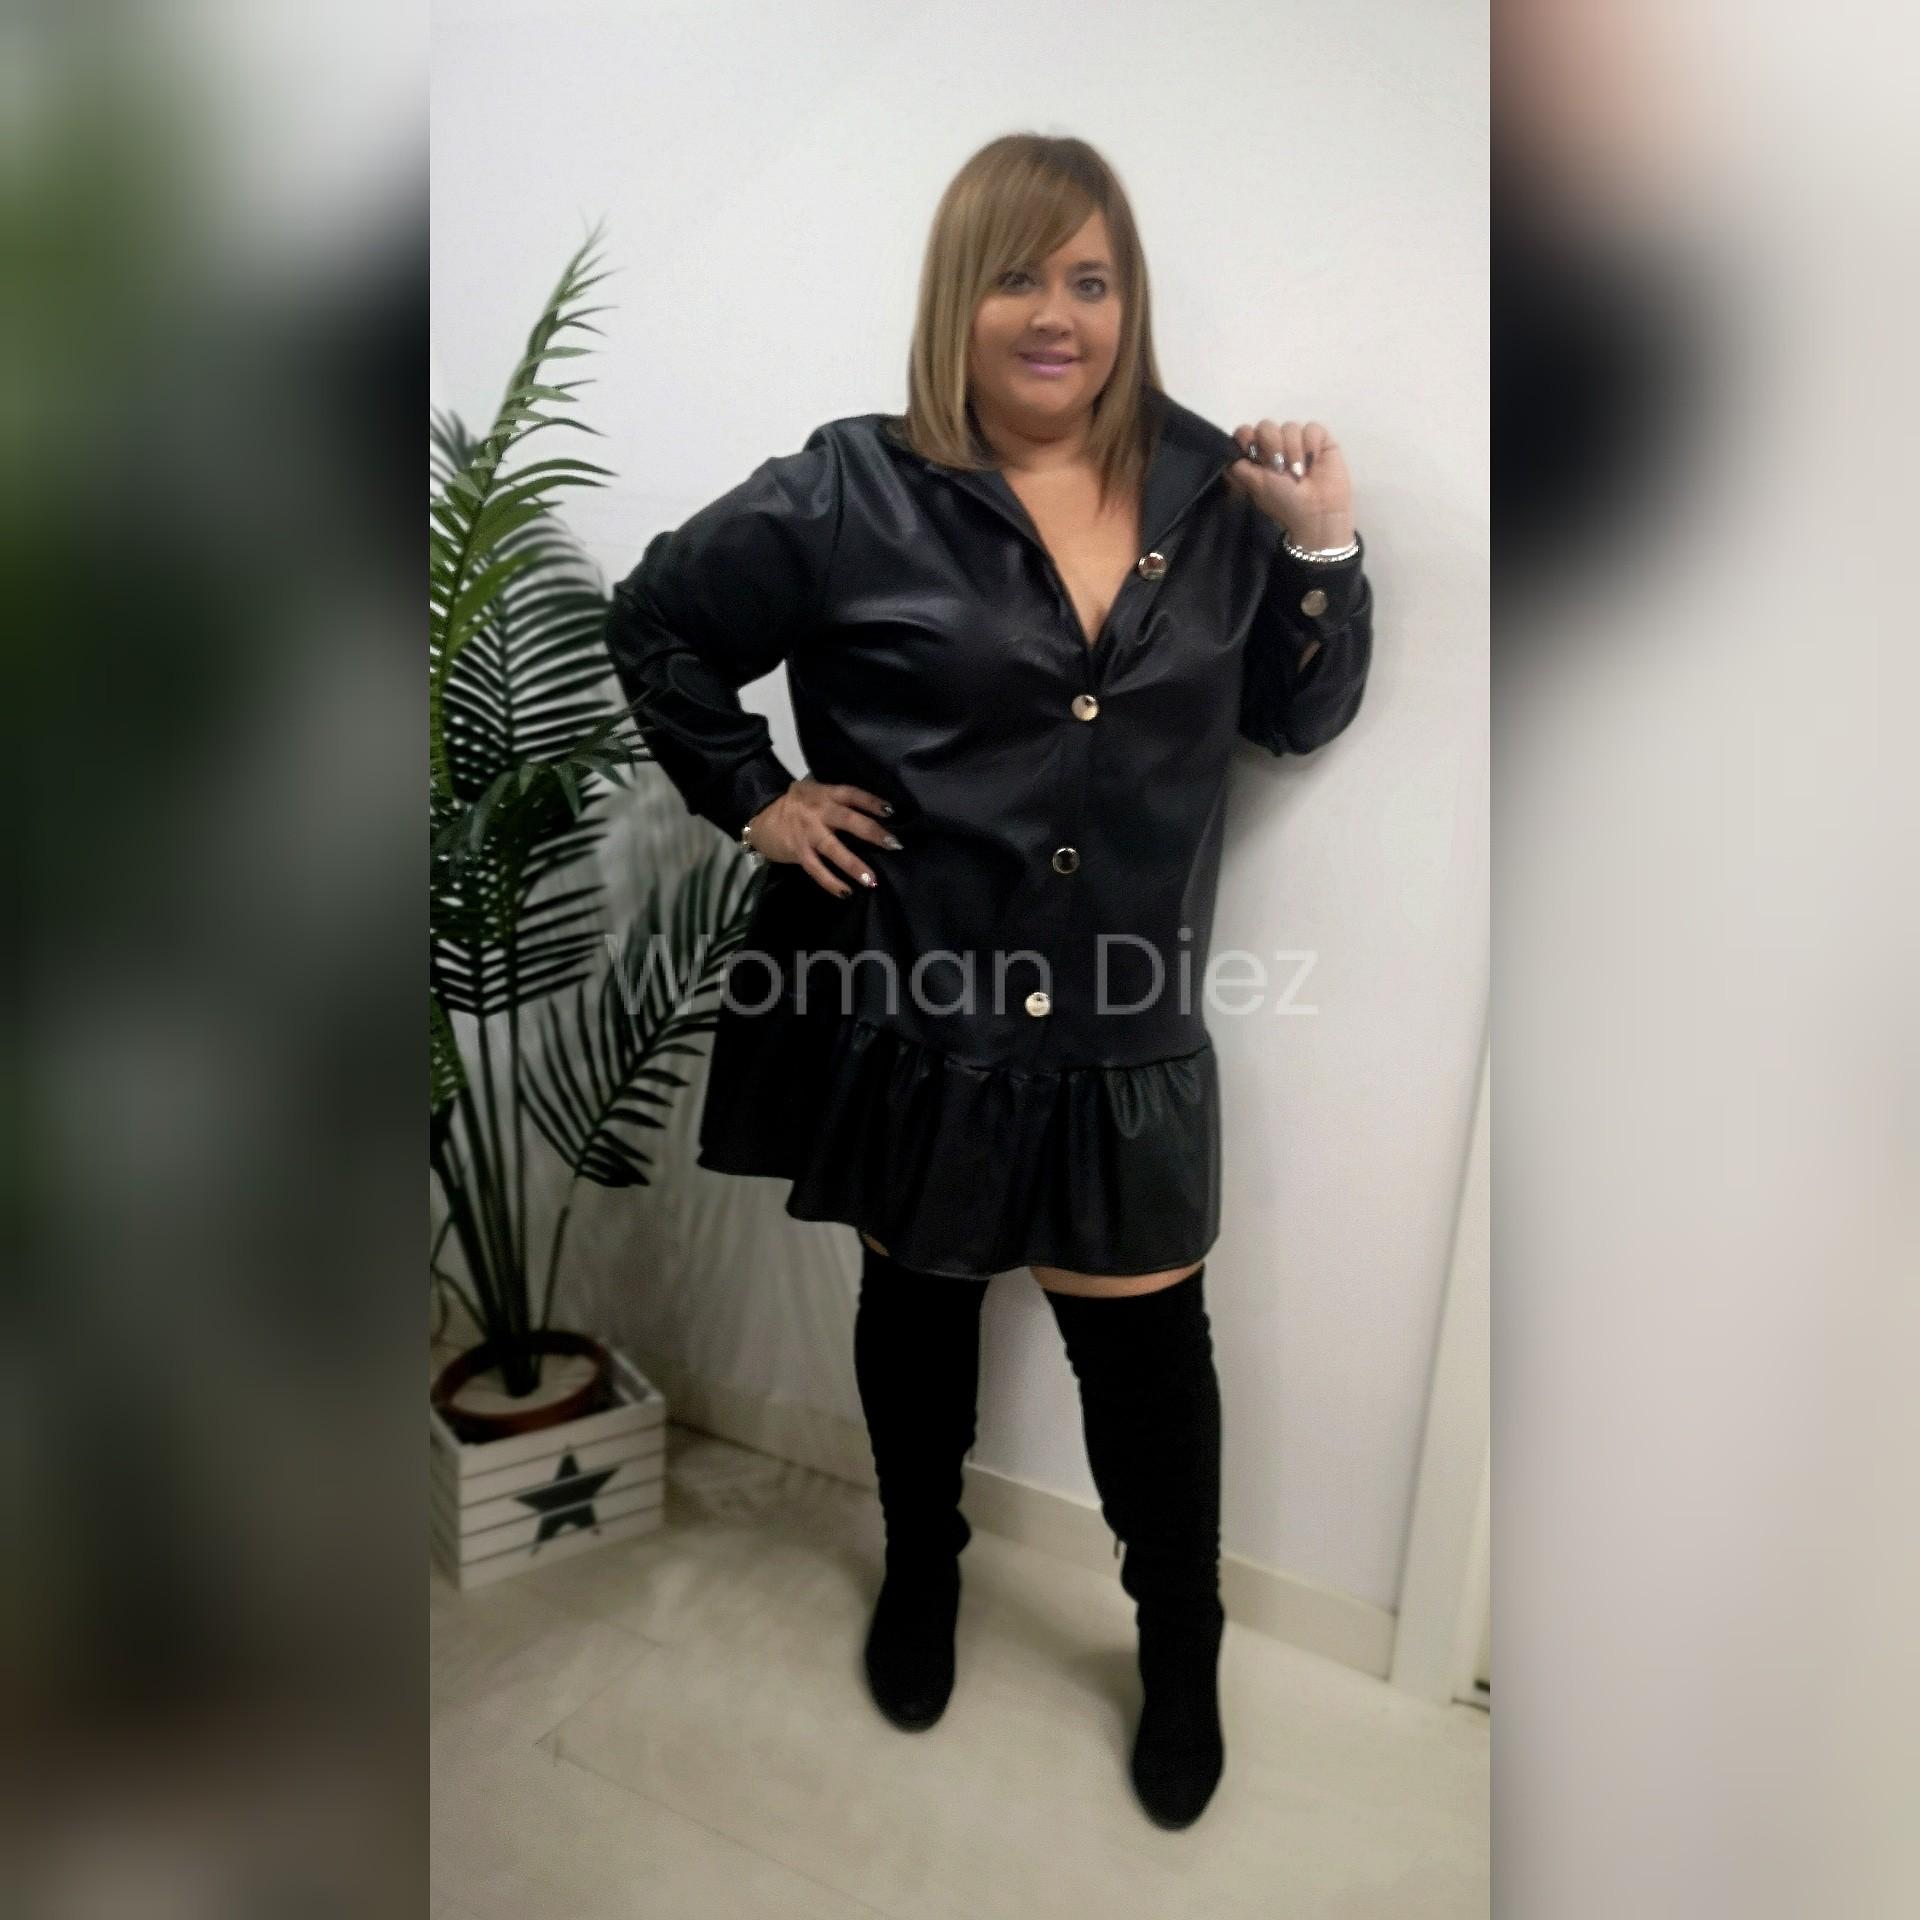 Vestido  Black pólipiel